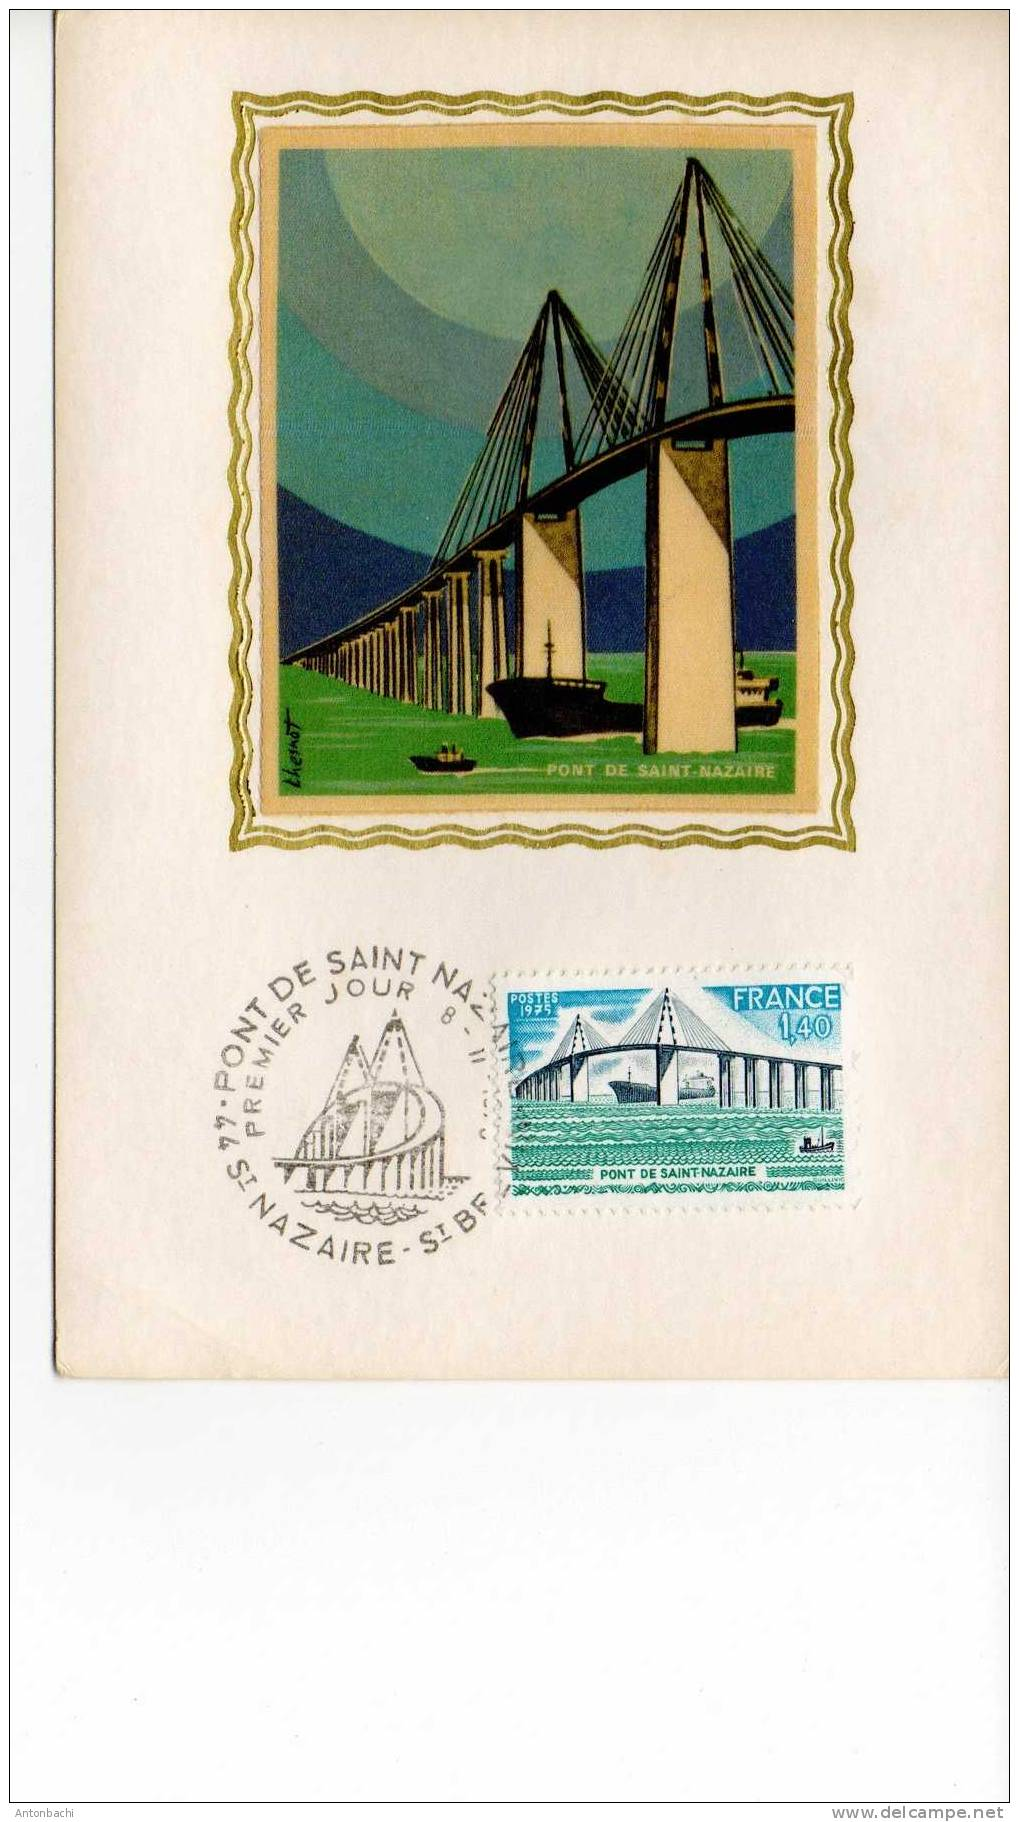 FRANCE - FDC / EPJ / SPD - CARTE POSTAL - 1975 - PONT DE SAINT NAZARE - YVERT 1856 SCOTT 1457 - Ponti